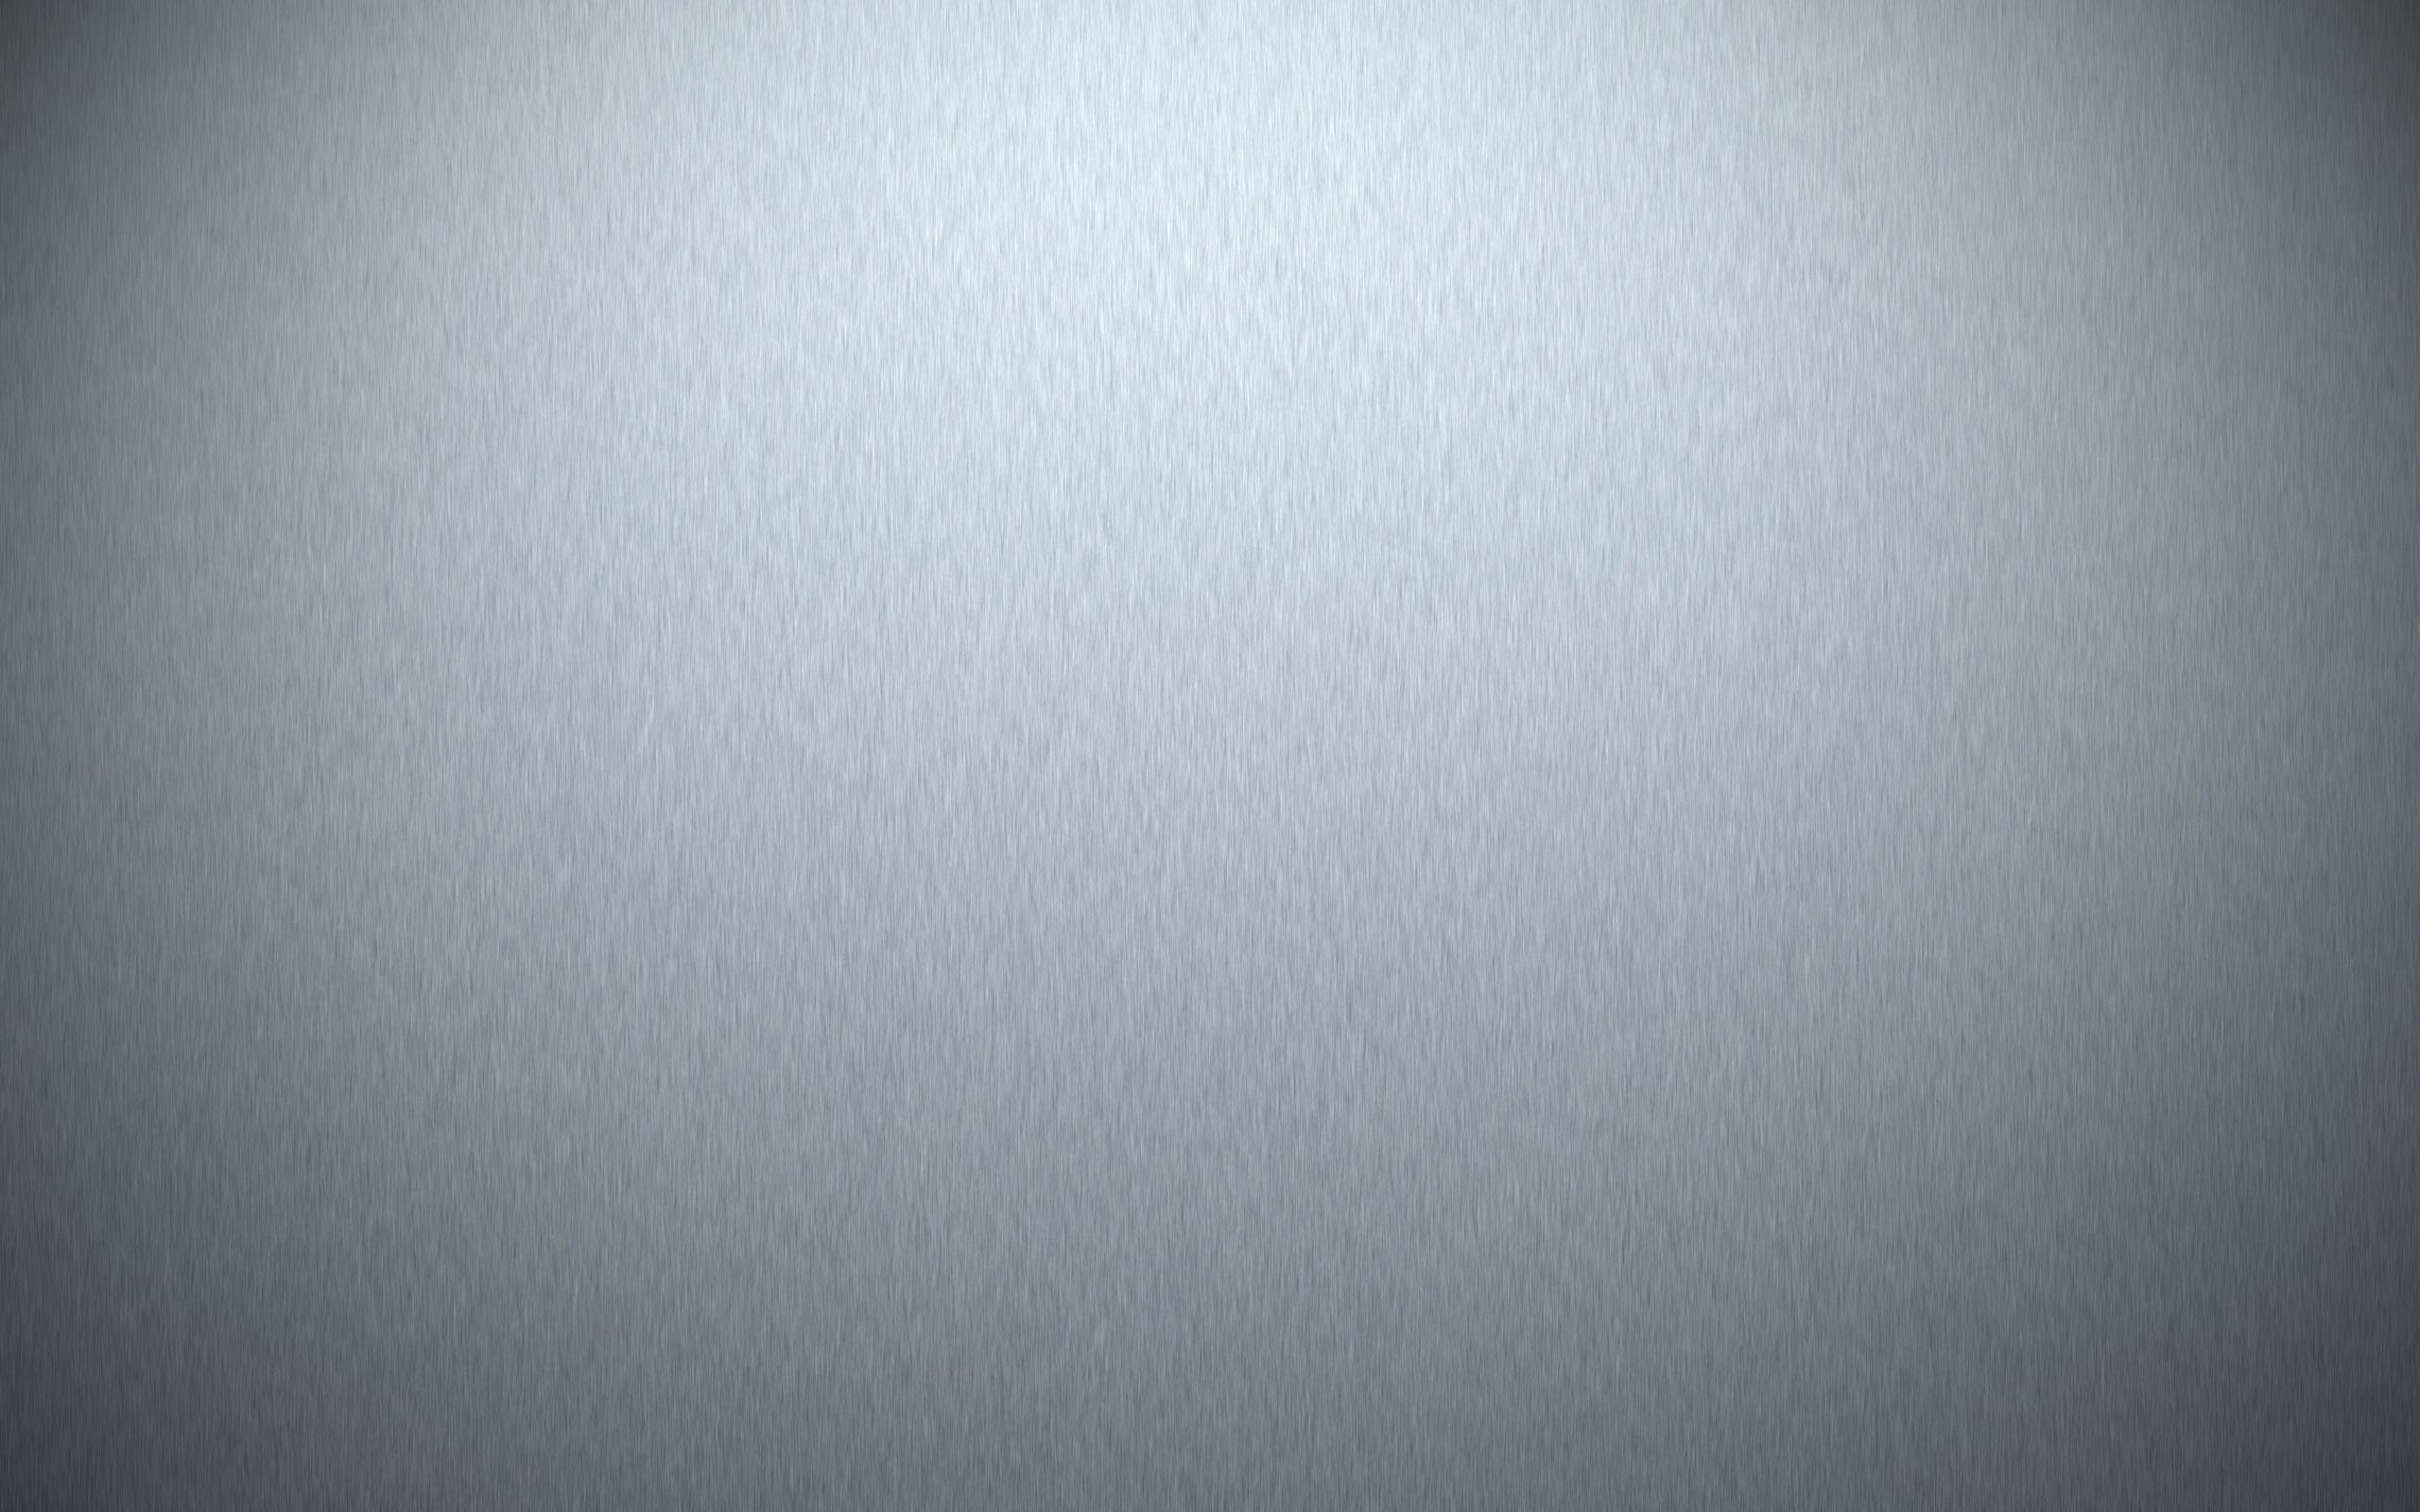 Wallpaper Surface Light Silver Background 2560x1600